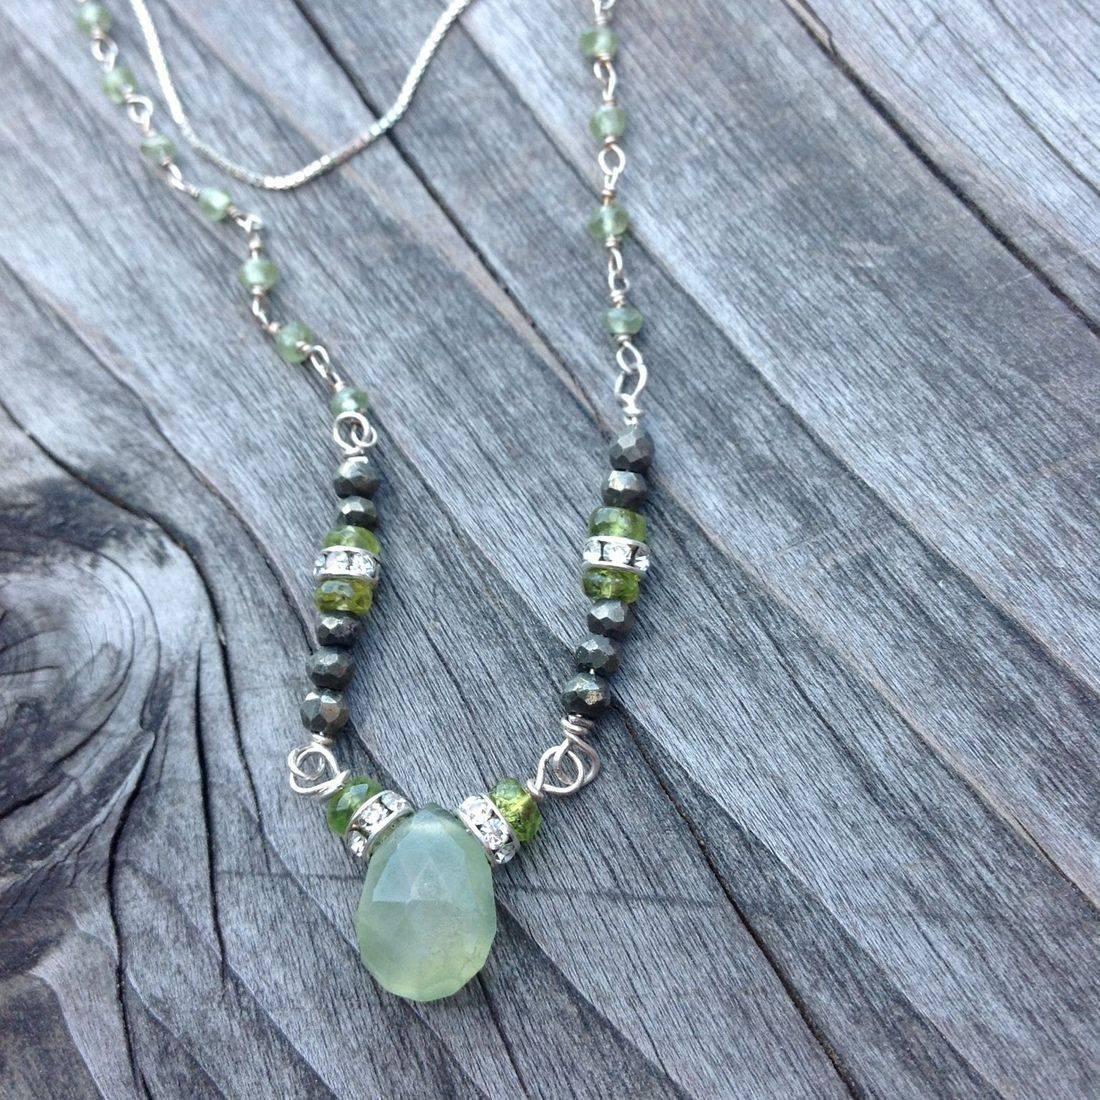 green garnet, sterling silver necklace, with gemstone beads, swarovski crystal spacers,